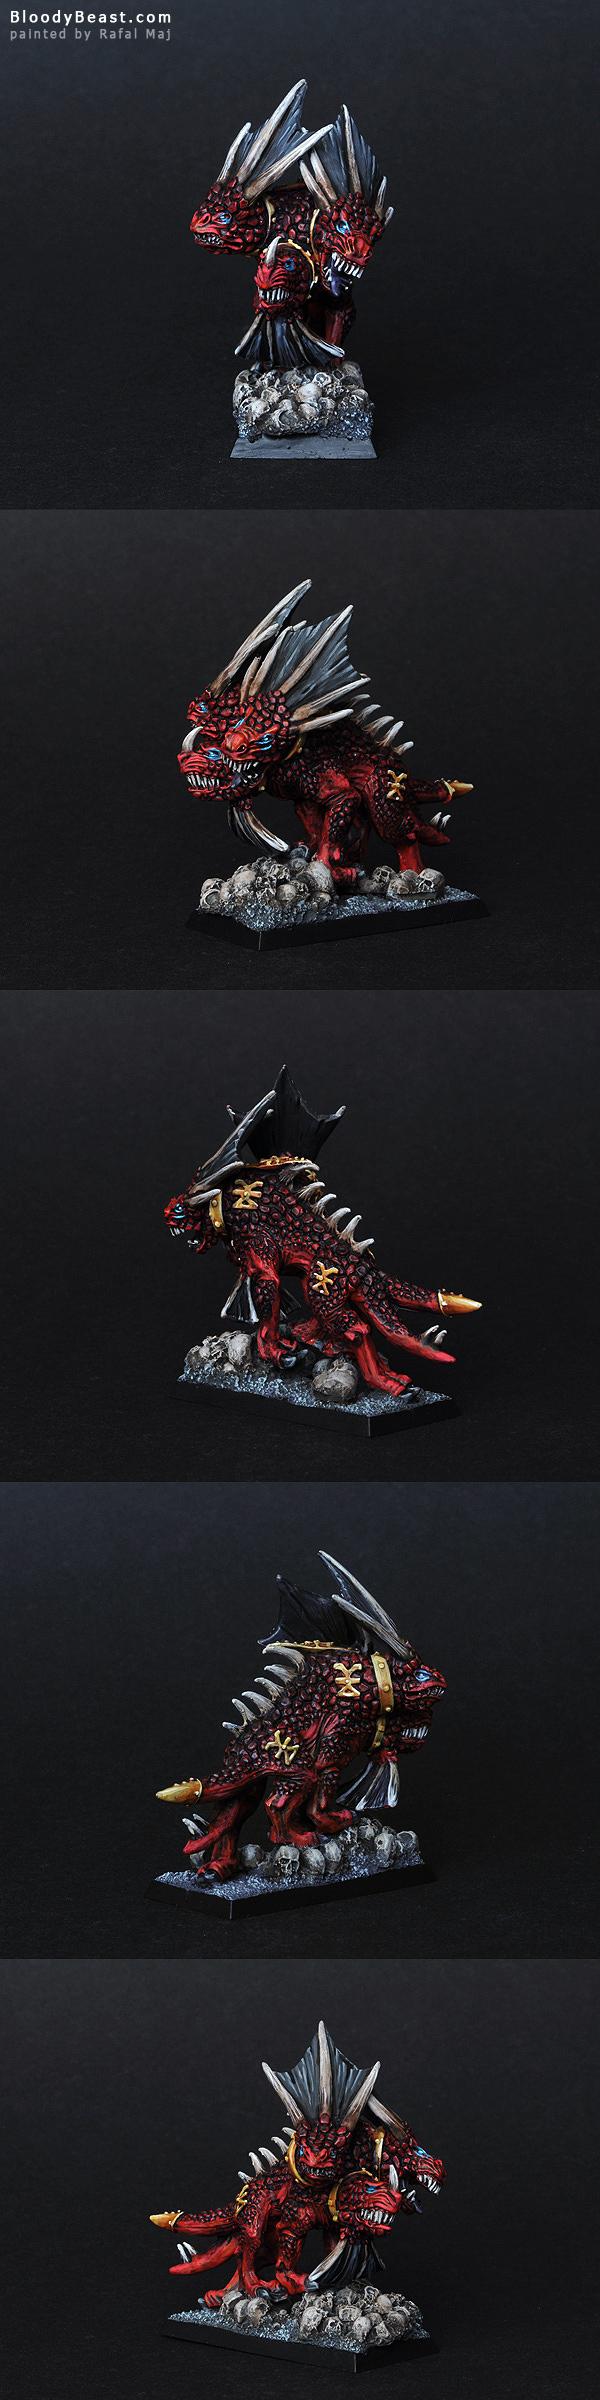 Karanak, Hound of Vengeance painted by Rafal Maj (BloodyBeast.com)